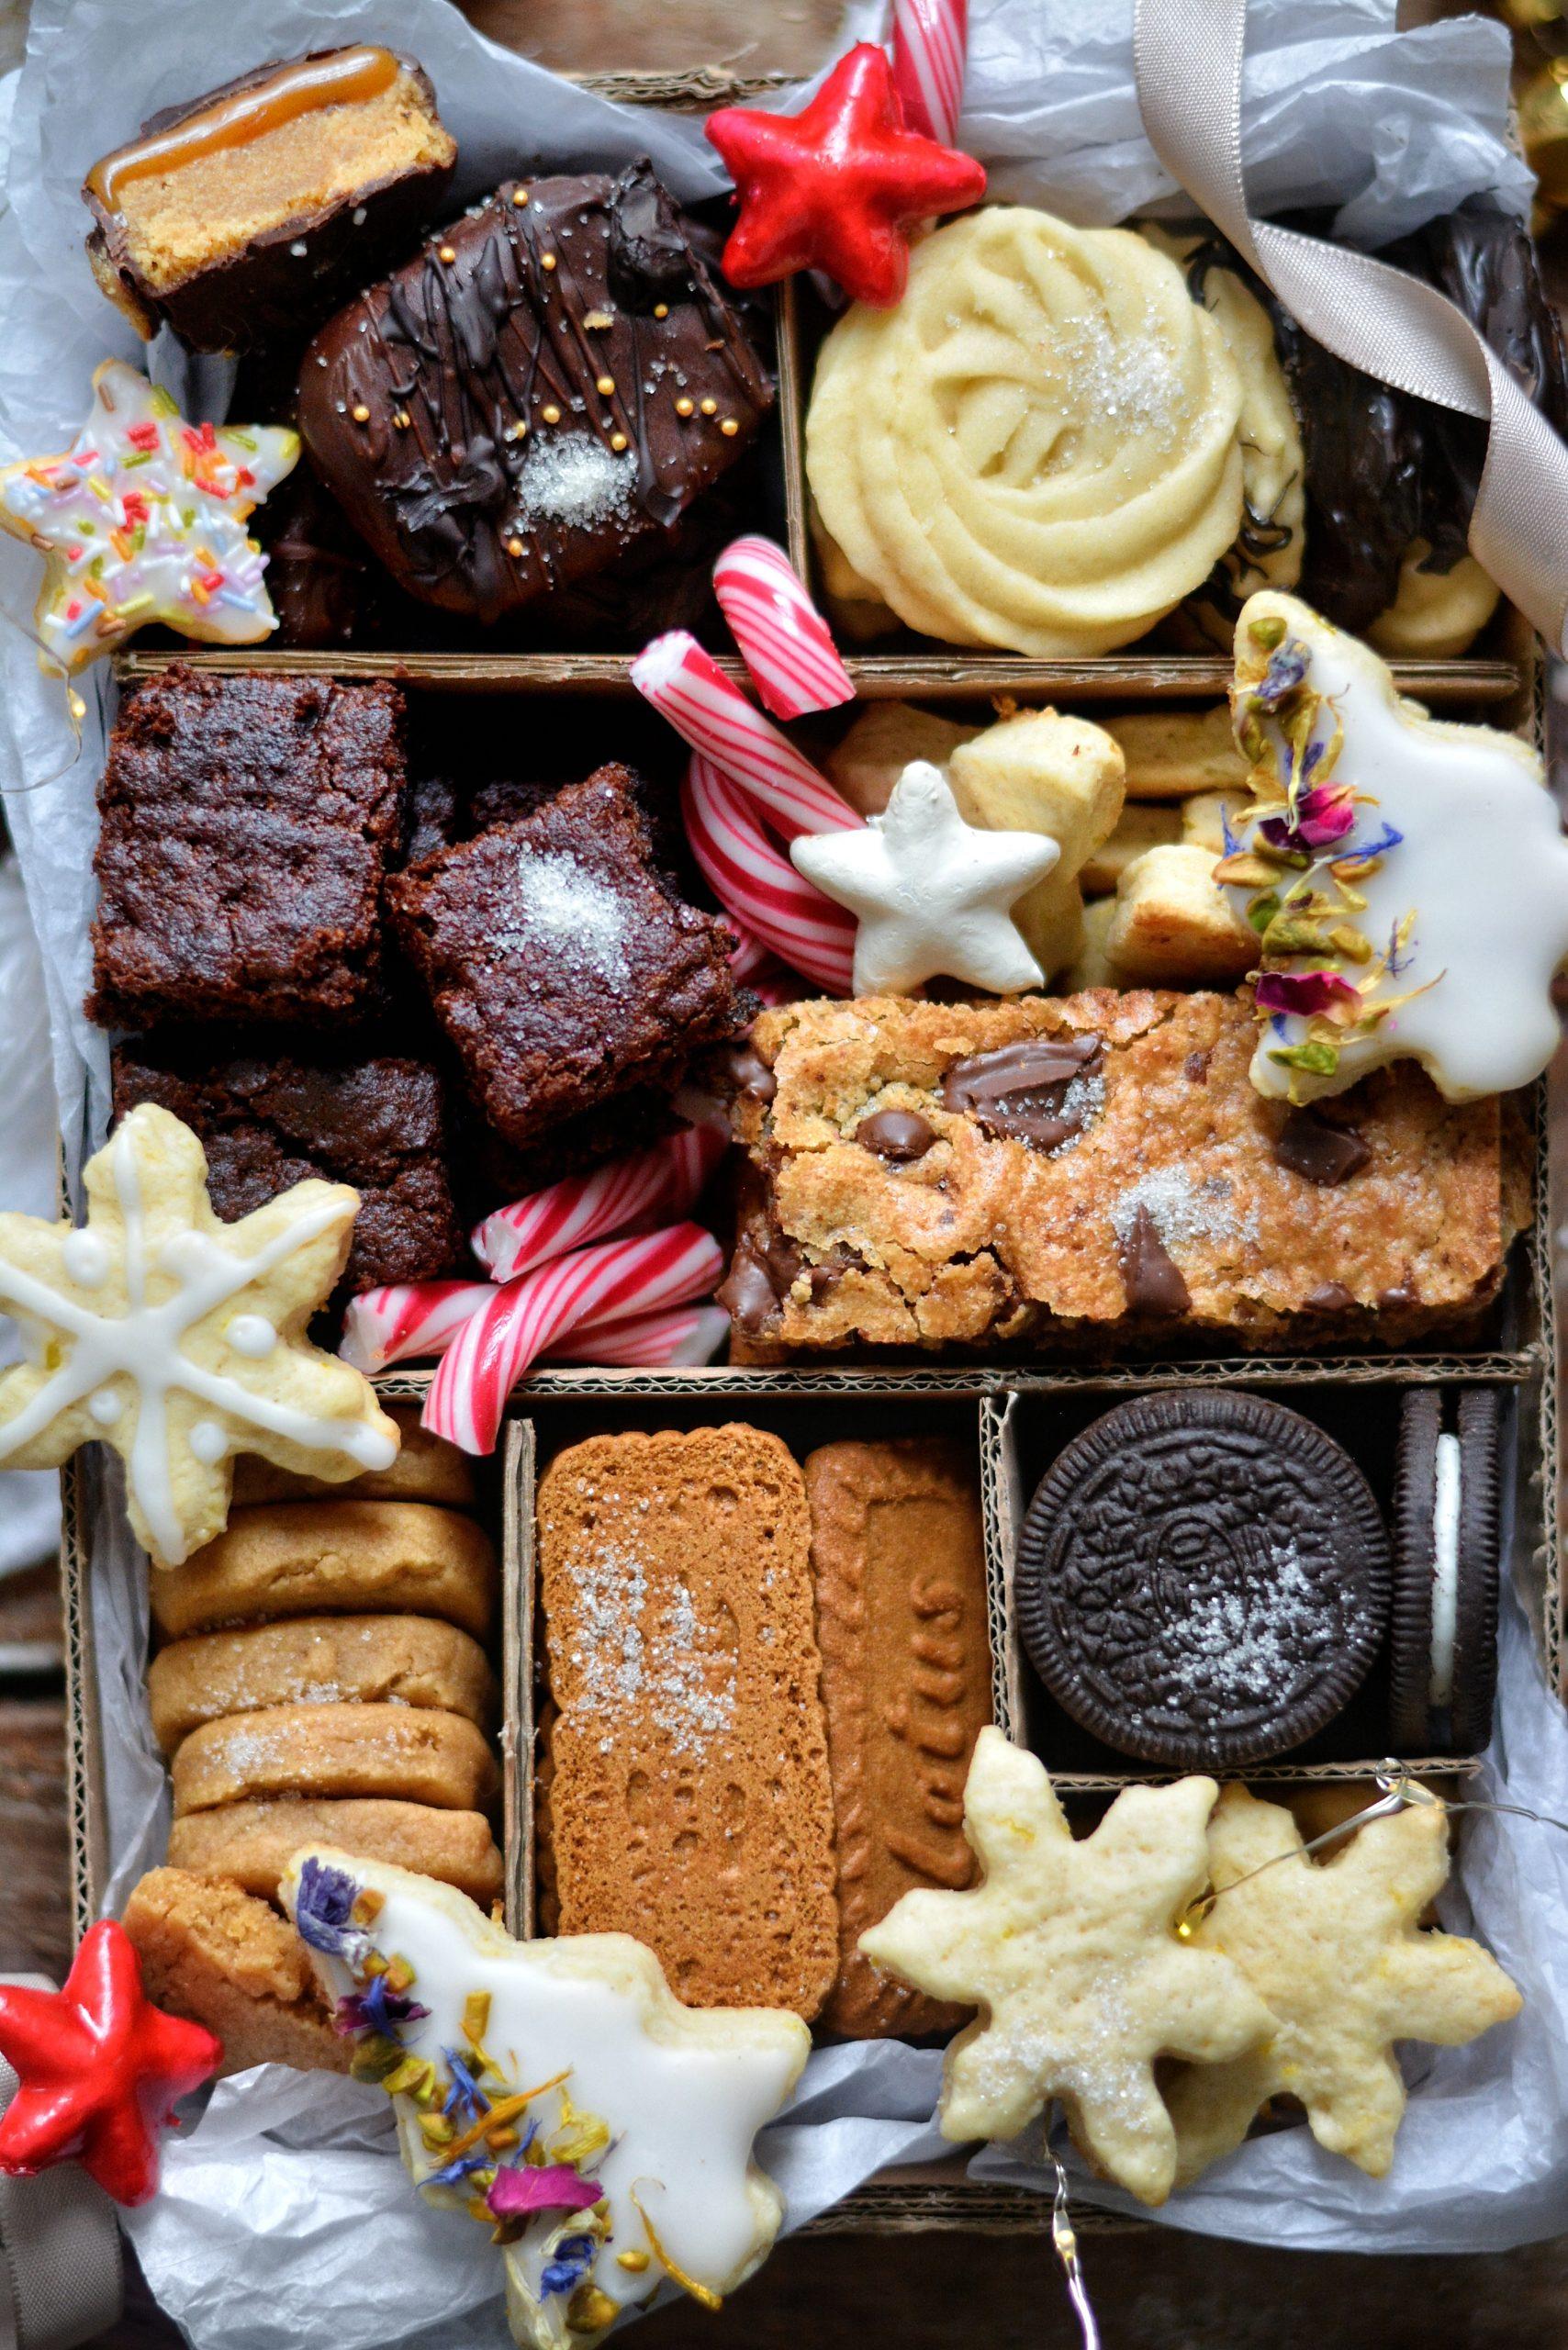 Comment réaliser une Boîte à Biscuits Vegan / How to Create The Best Vegan Cookie Box